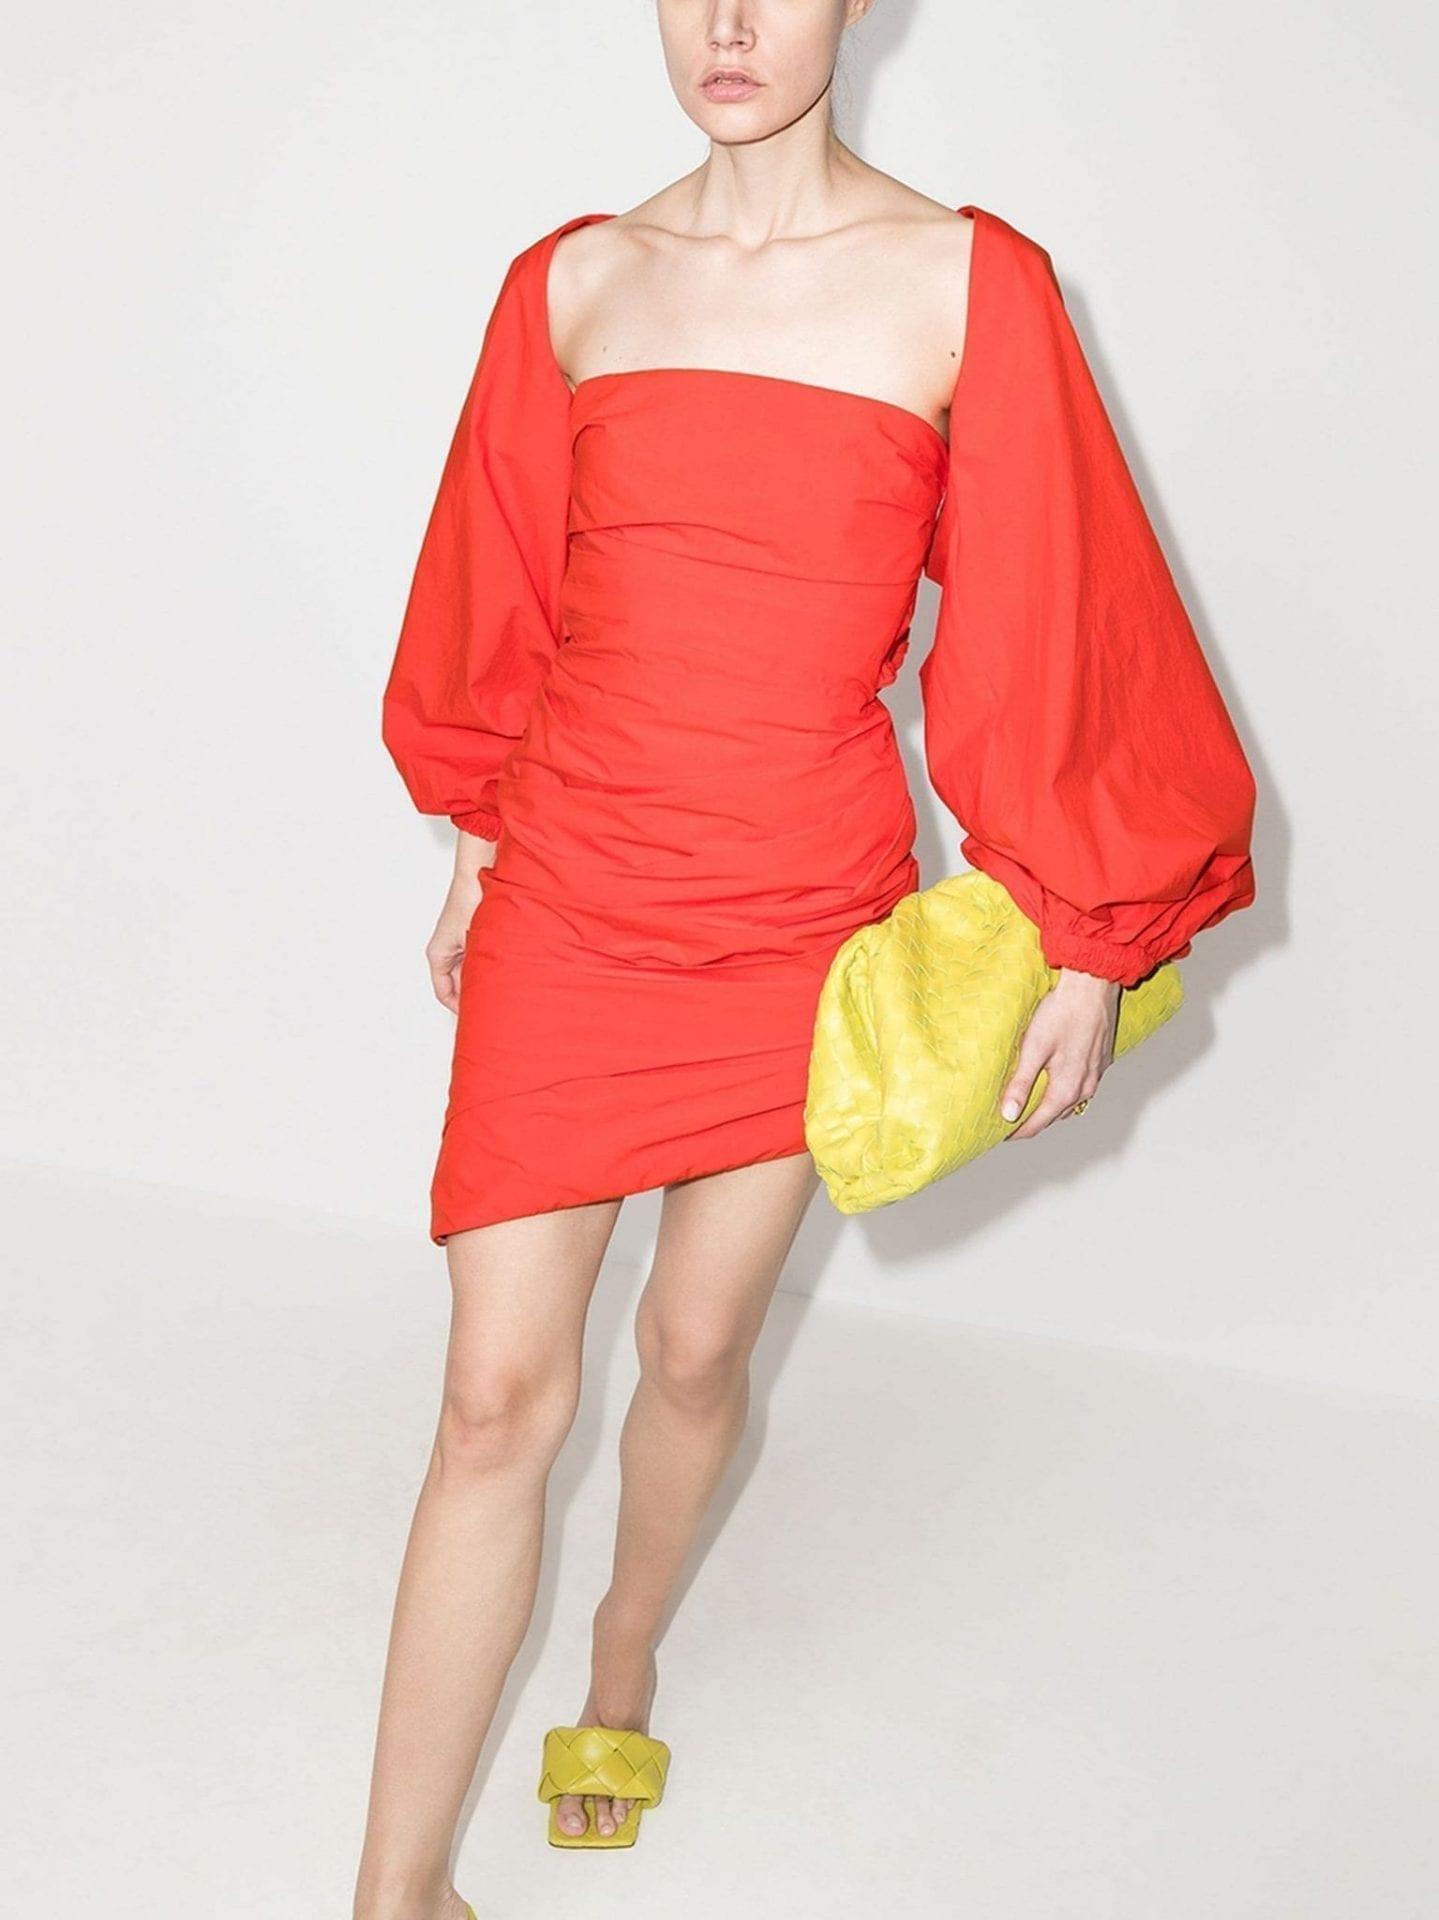 JOHANNA ORTIZ Immerse Yourself Ruched Mini Dress